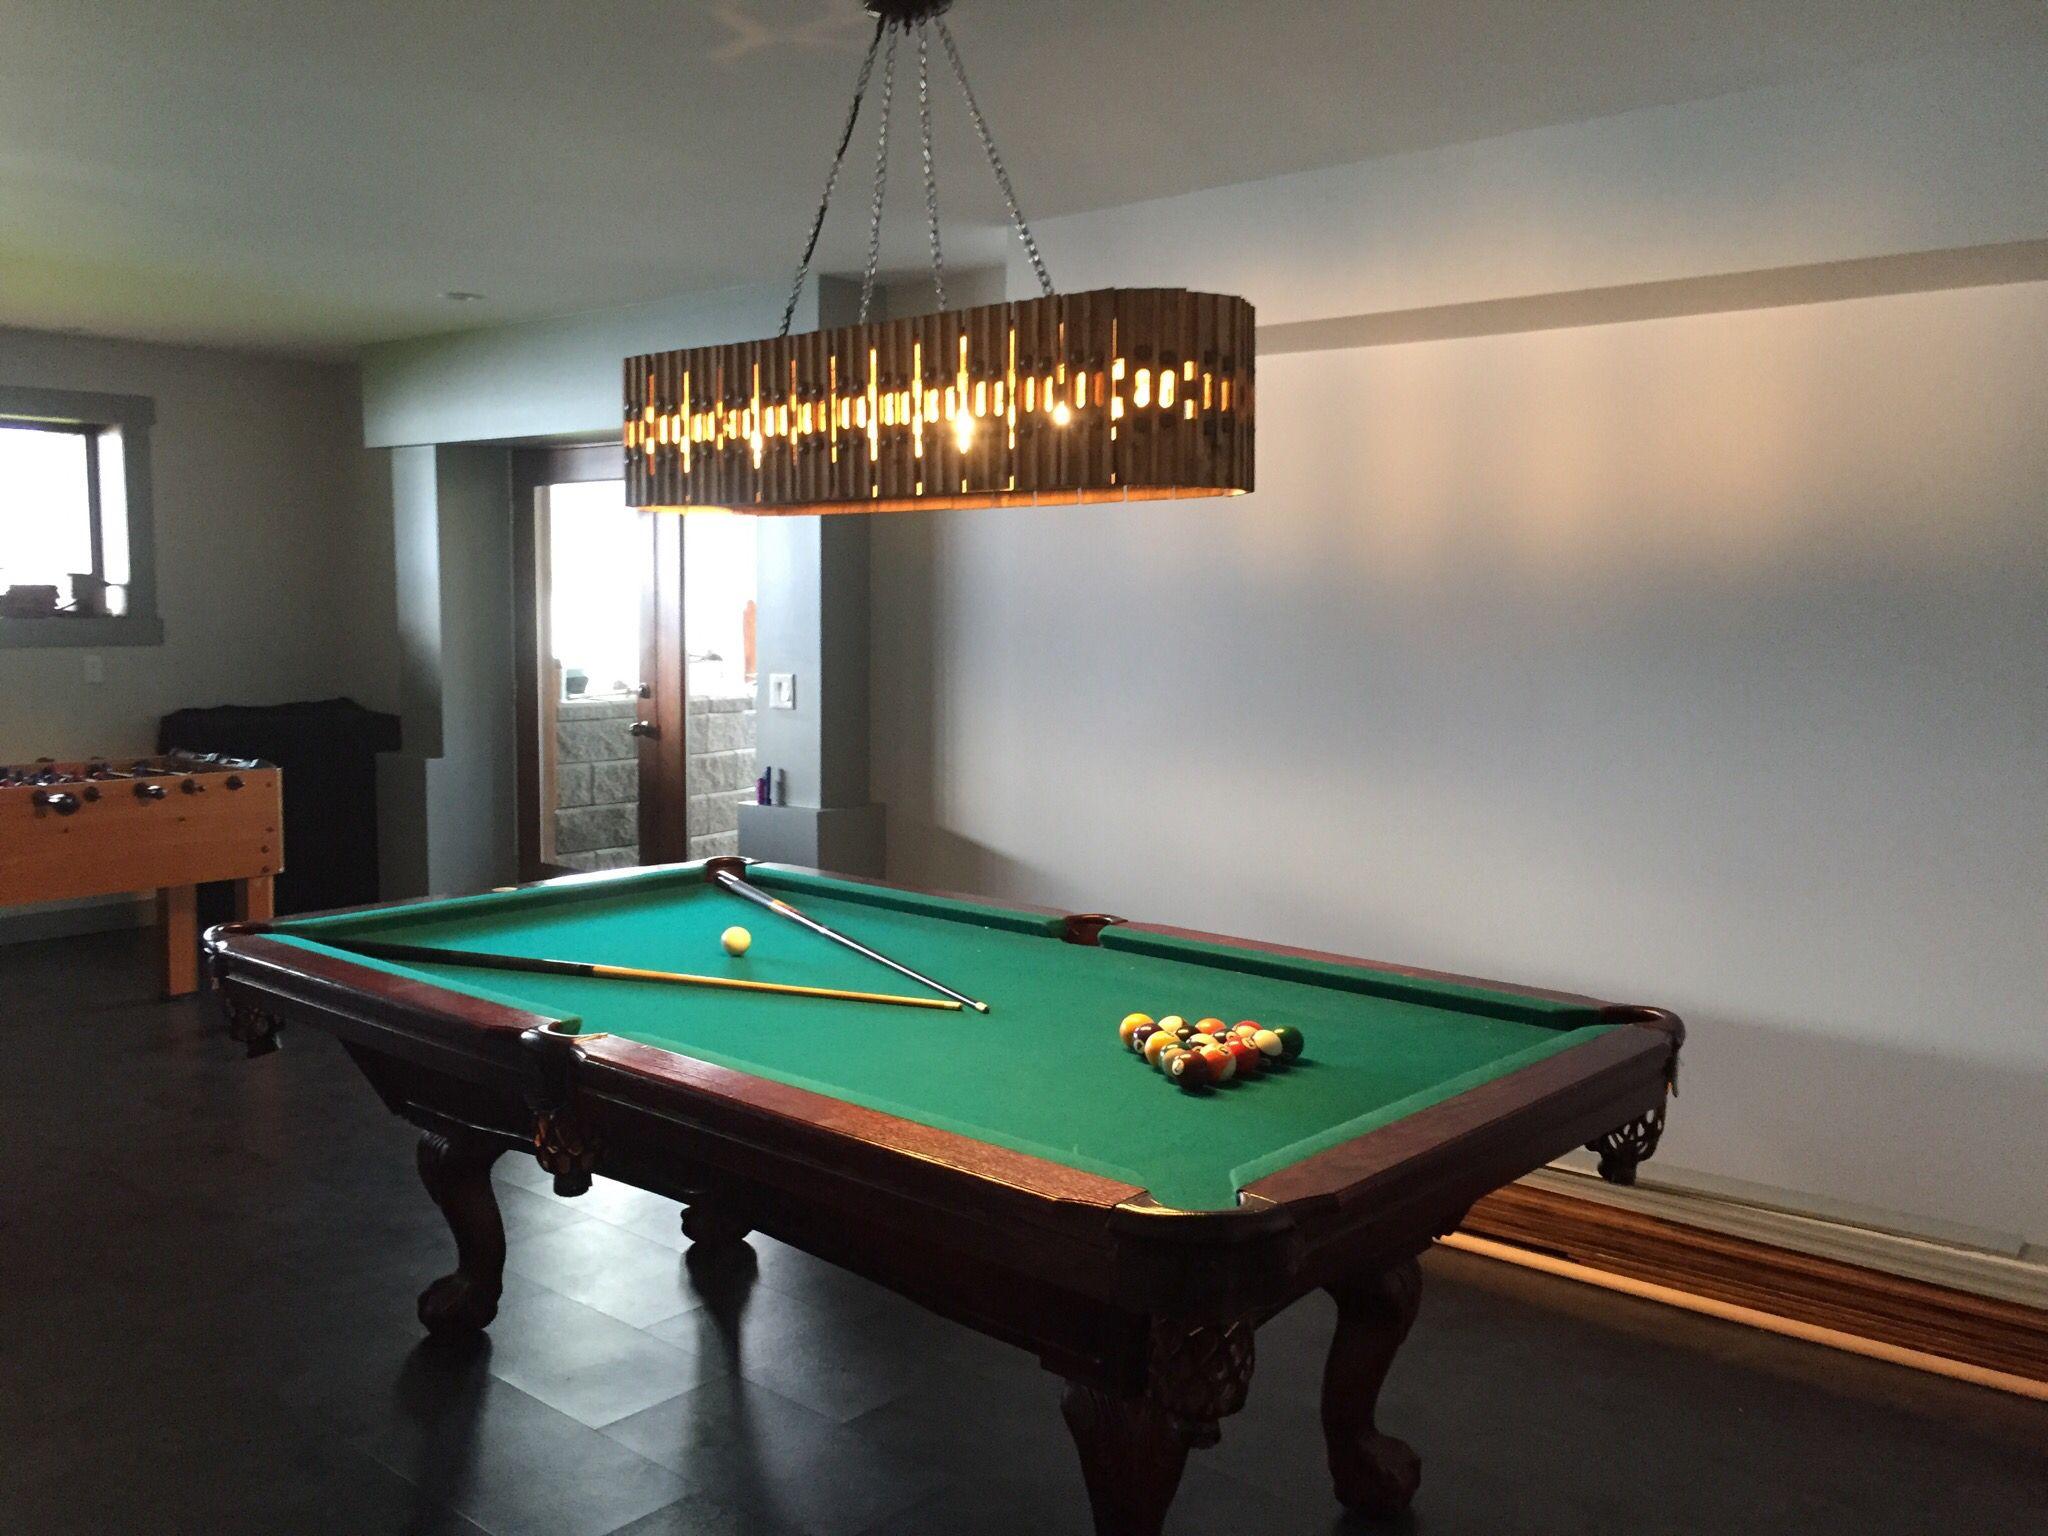 Unique pool table light Pool table lighting, Pool table